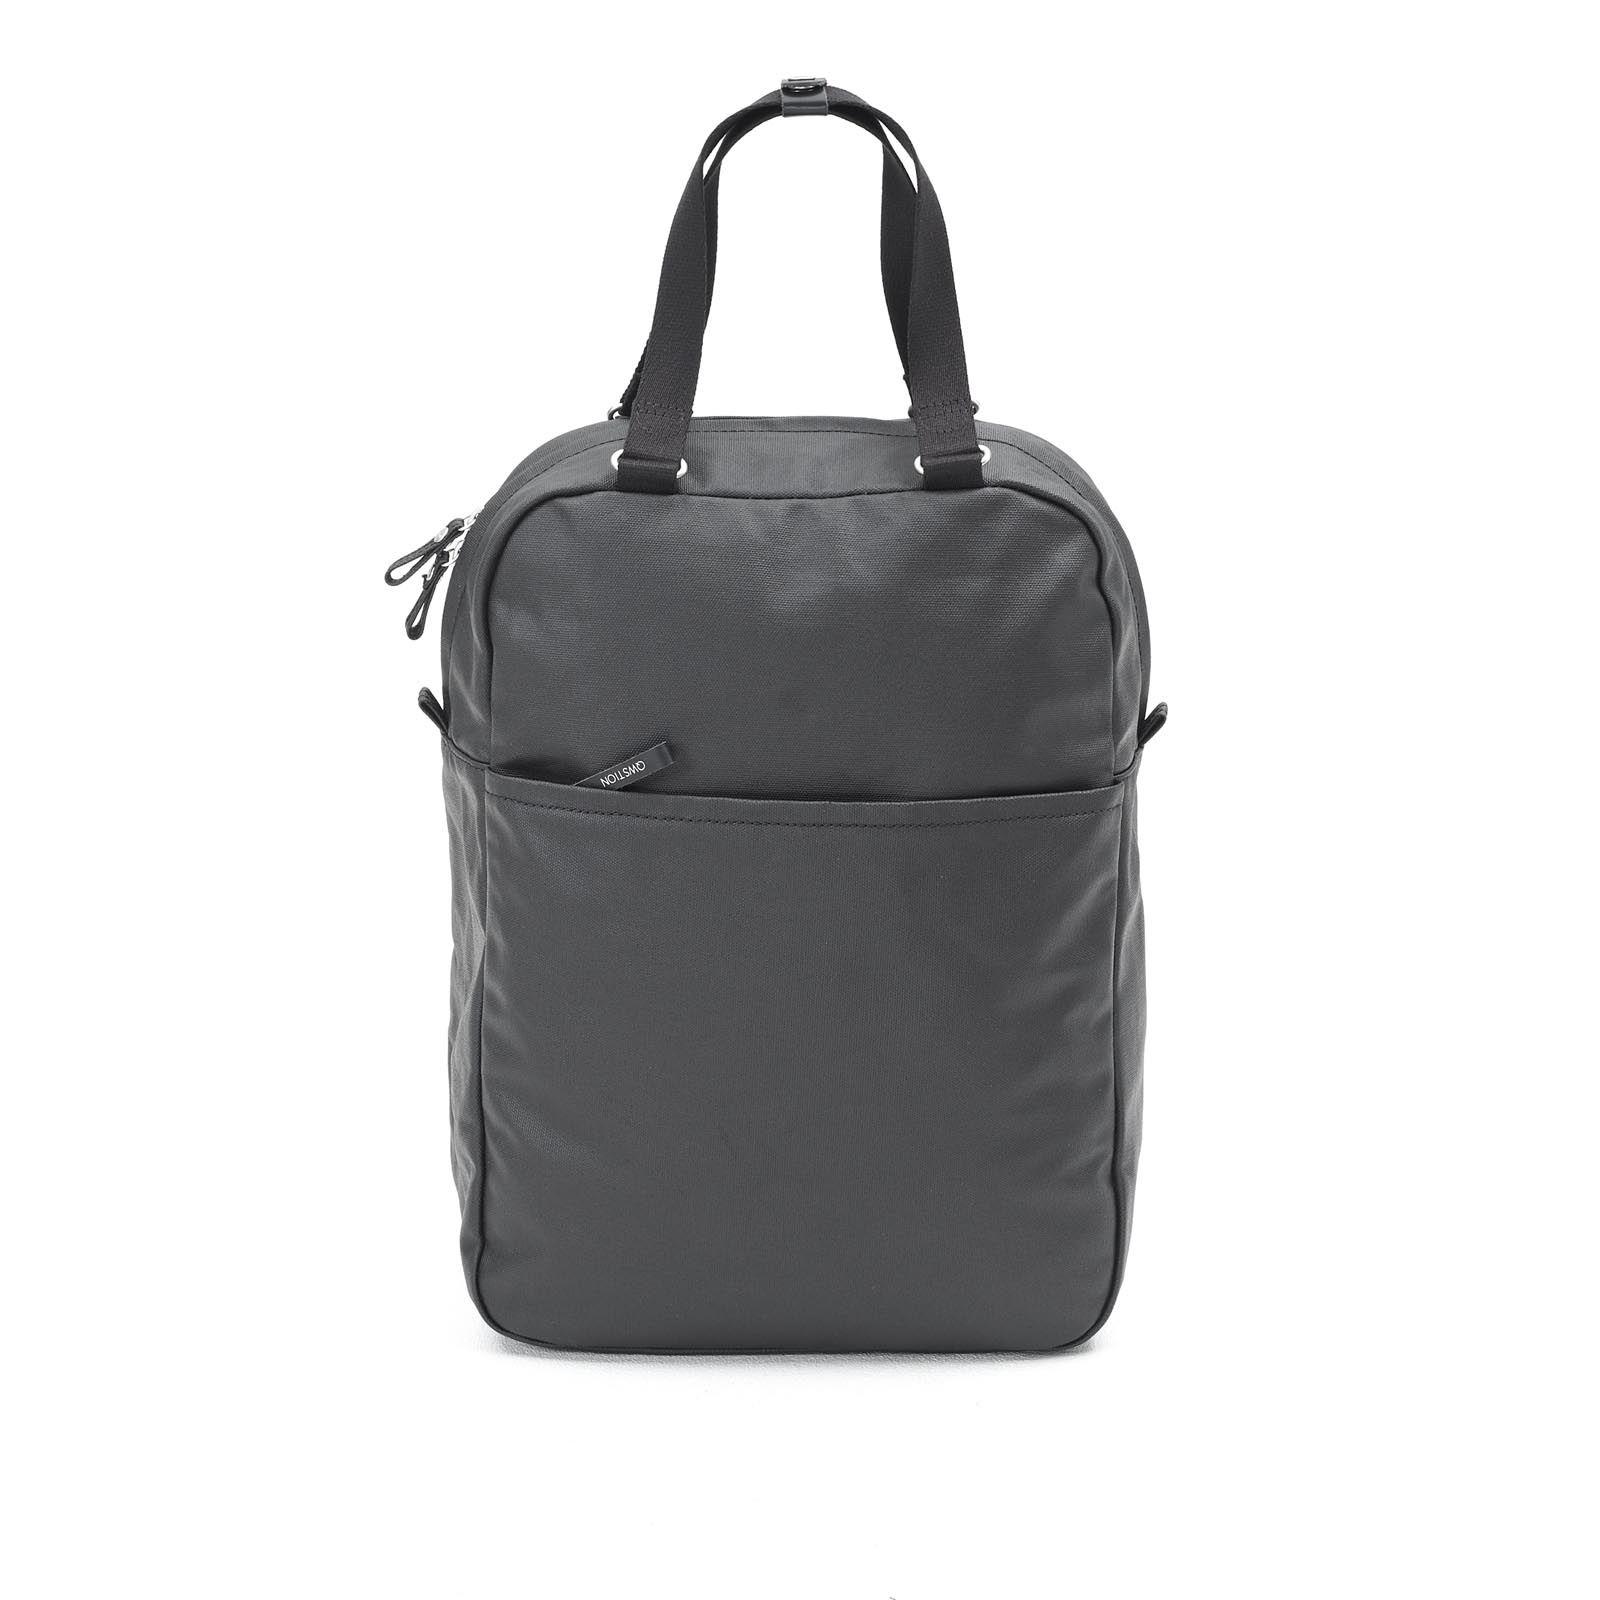 Simple Pack - Organic Jet Black